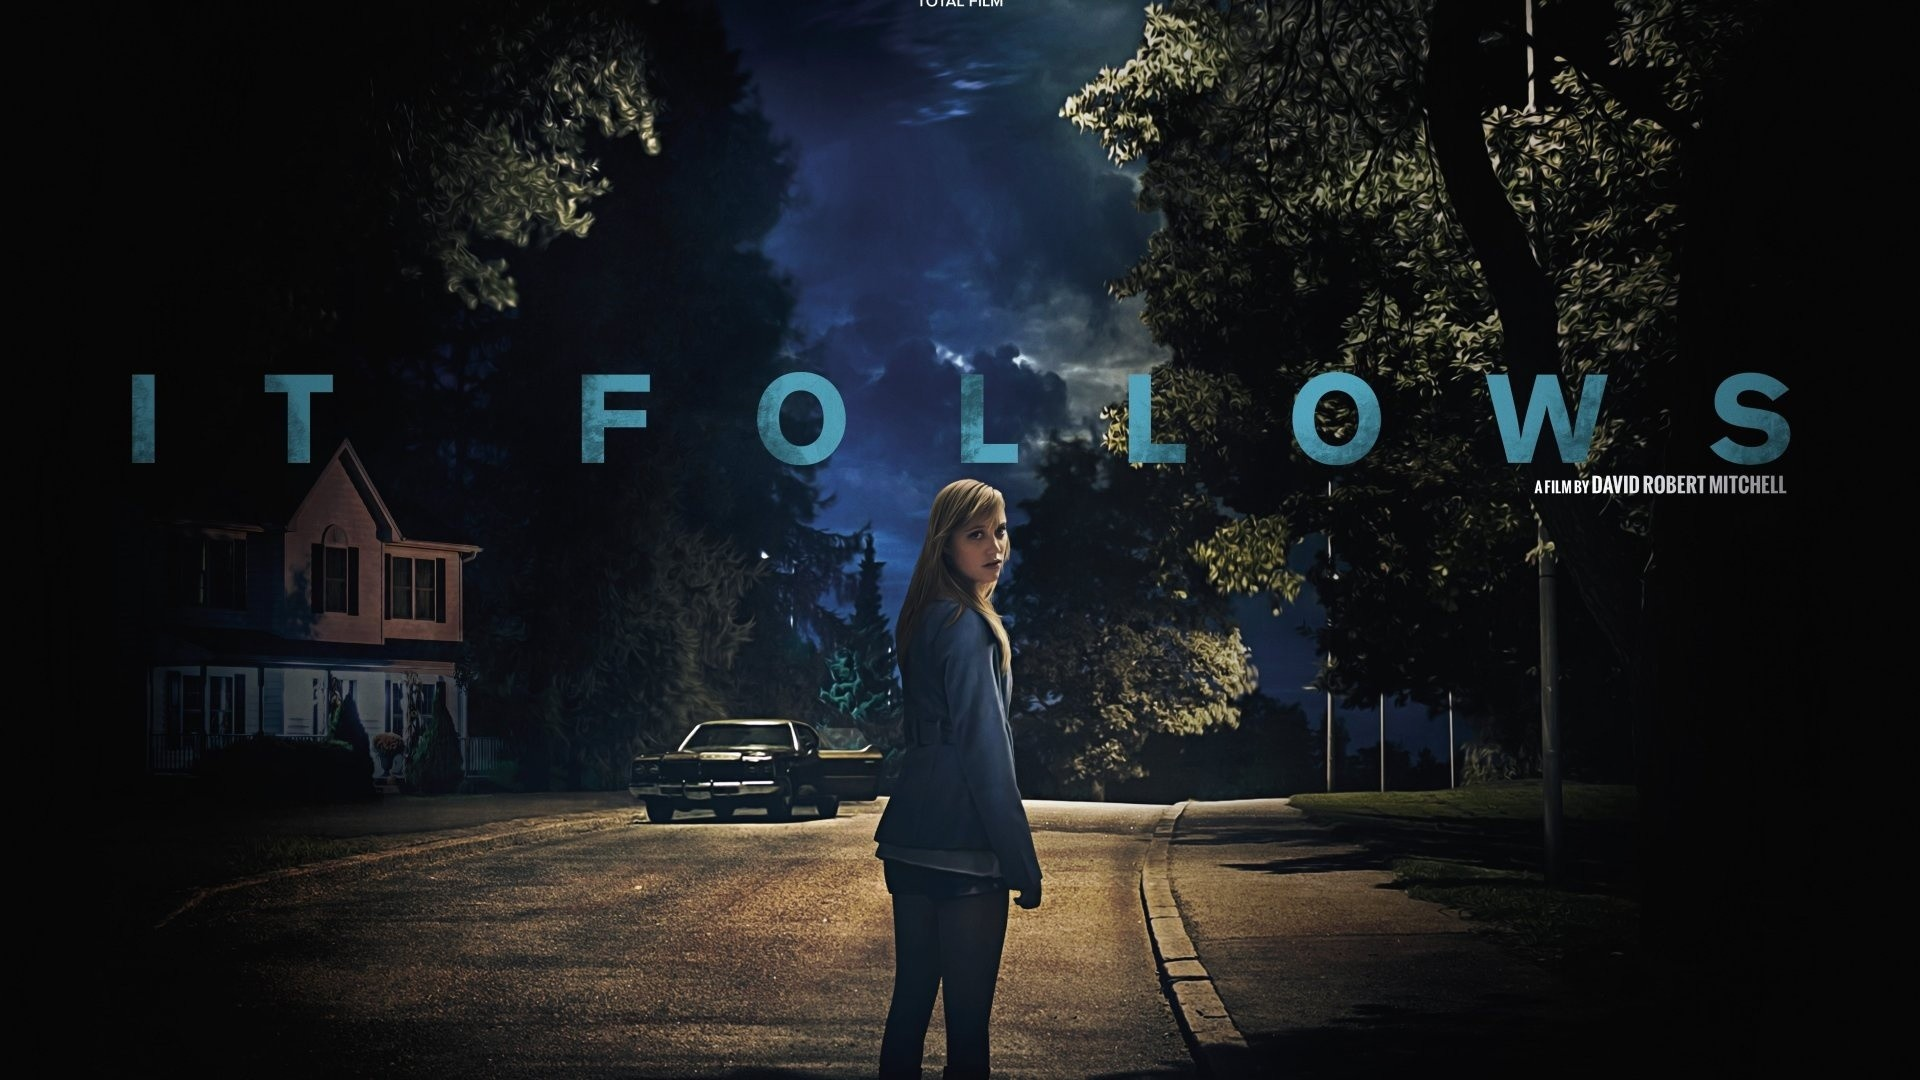 Movie, Tv Seriers, Horror, Ghost, Itfollows, It Follows, It Follows